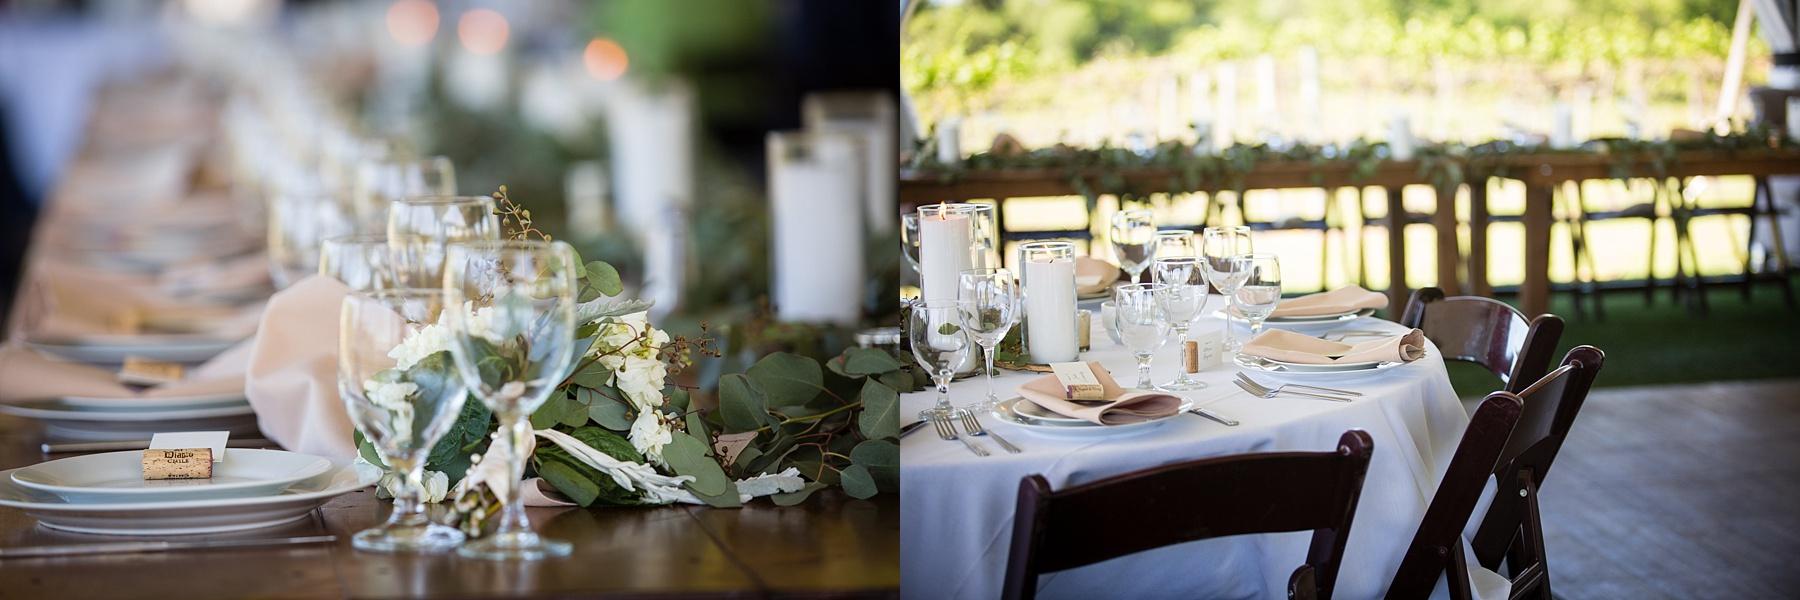 Brandon_Shafer_Photography_Kara_Doug_12_corners_Wedding_Benton_Harbor_0054.jpg